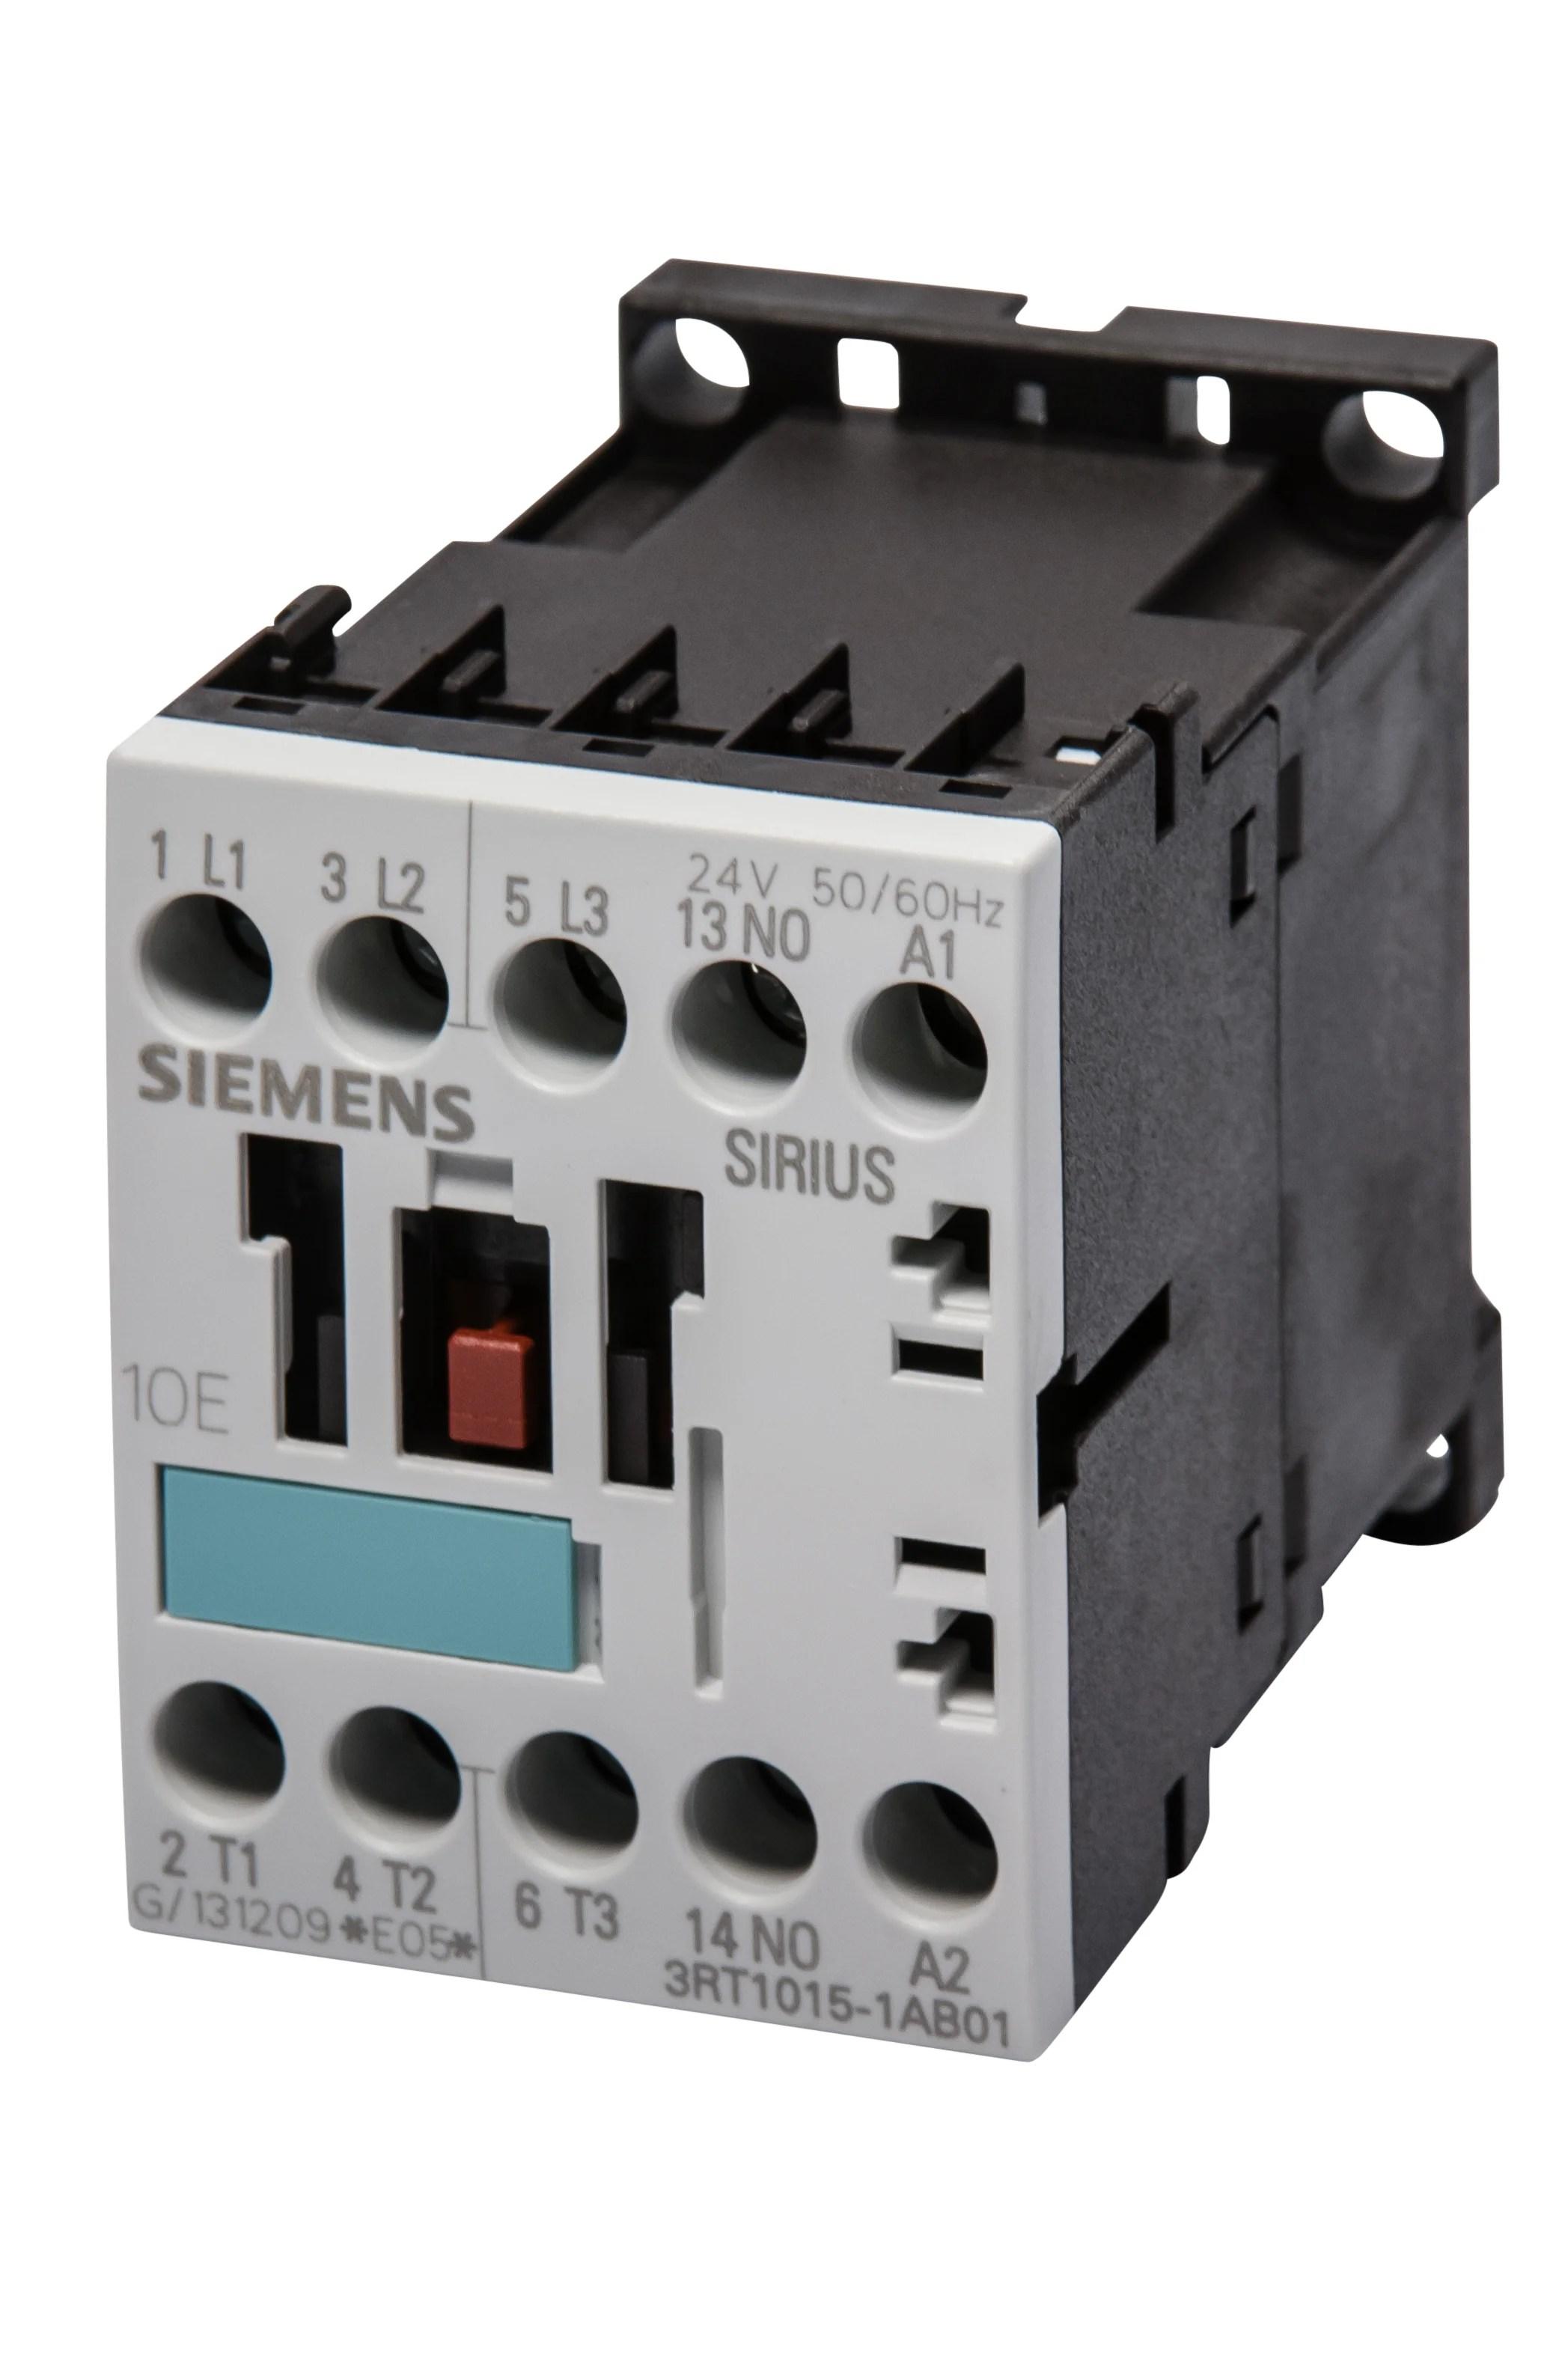 3RT1015 1A Siemens Sirius?resize=360%2C380 siemens motor starter wiring diagram the best wiring diagram 2017 furnas motor starter wiring diagram at edmiracle.co